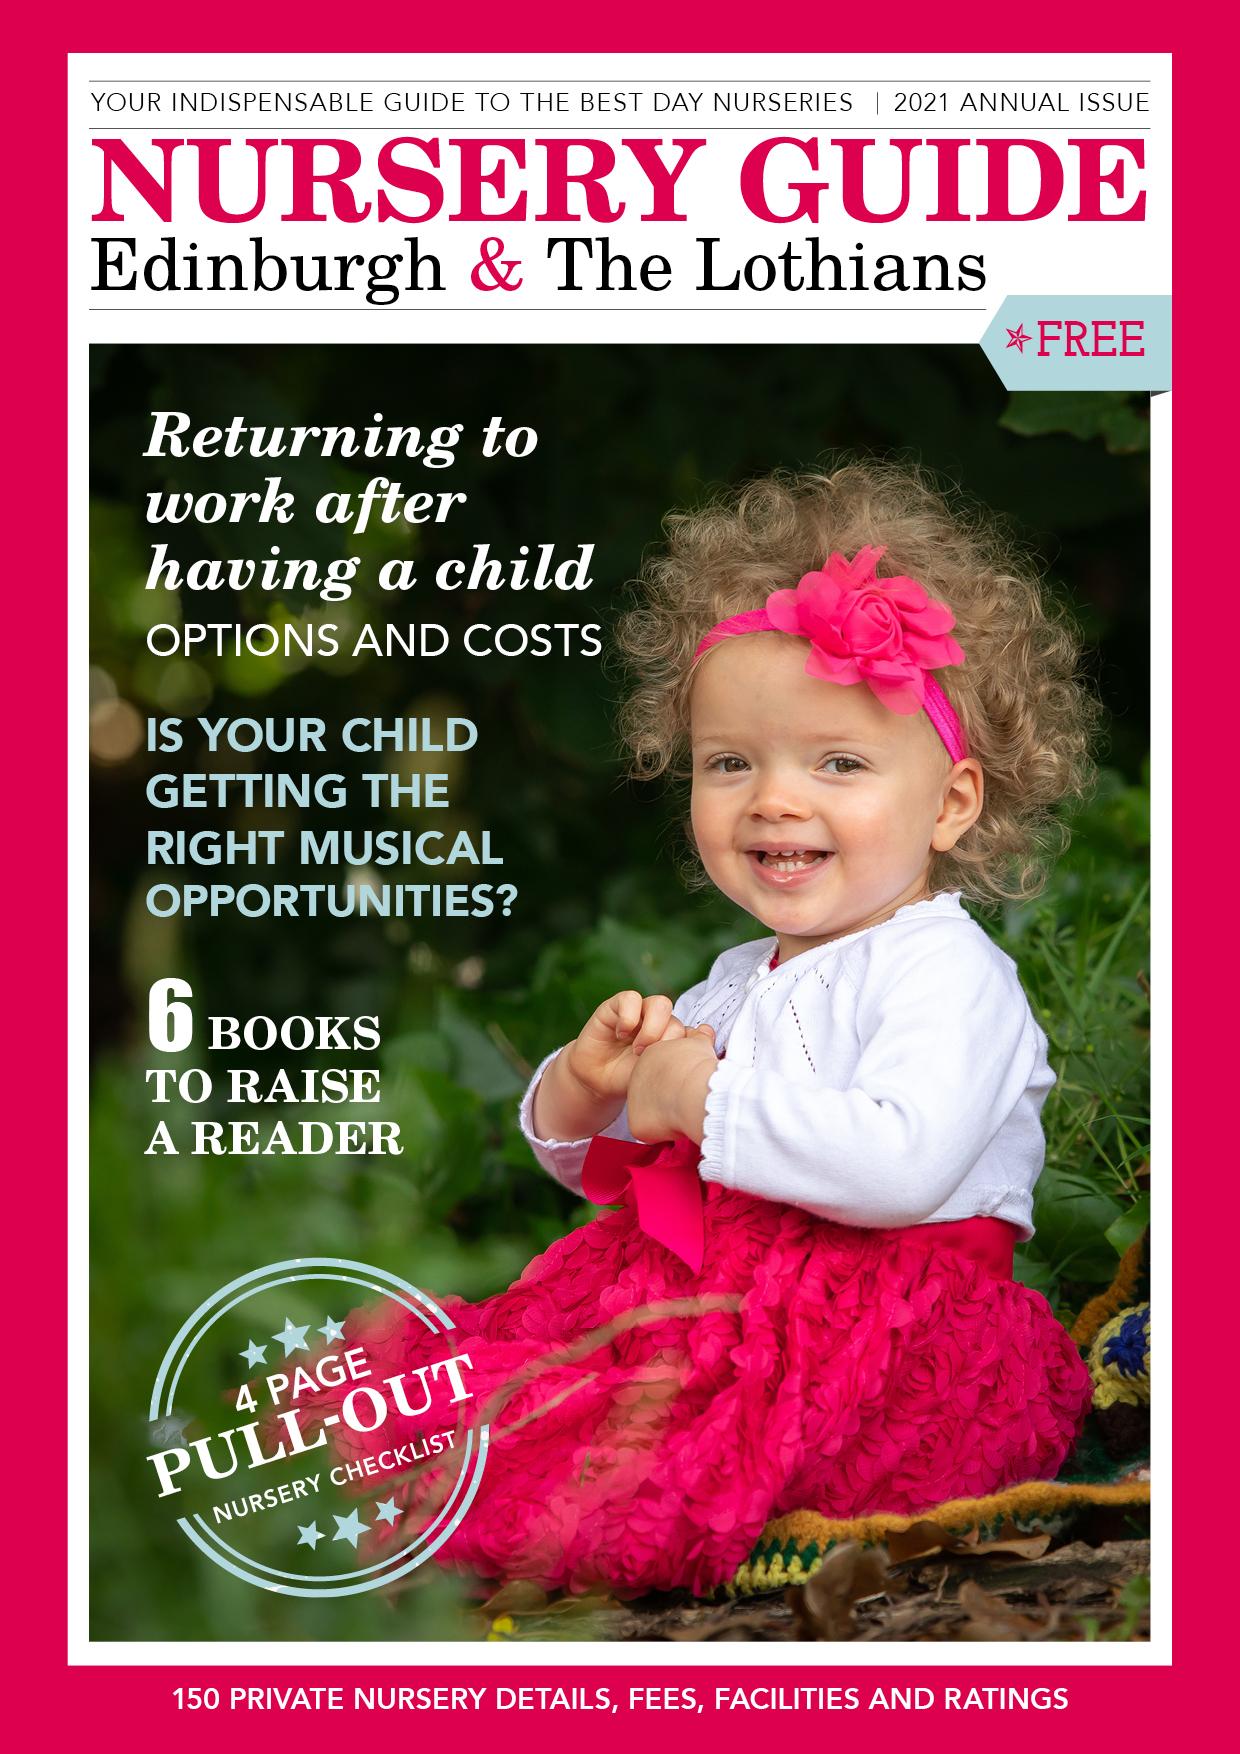 2021 Nursery Guide Edinburgh & the Lothians